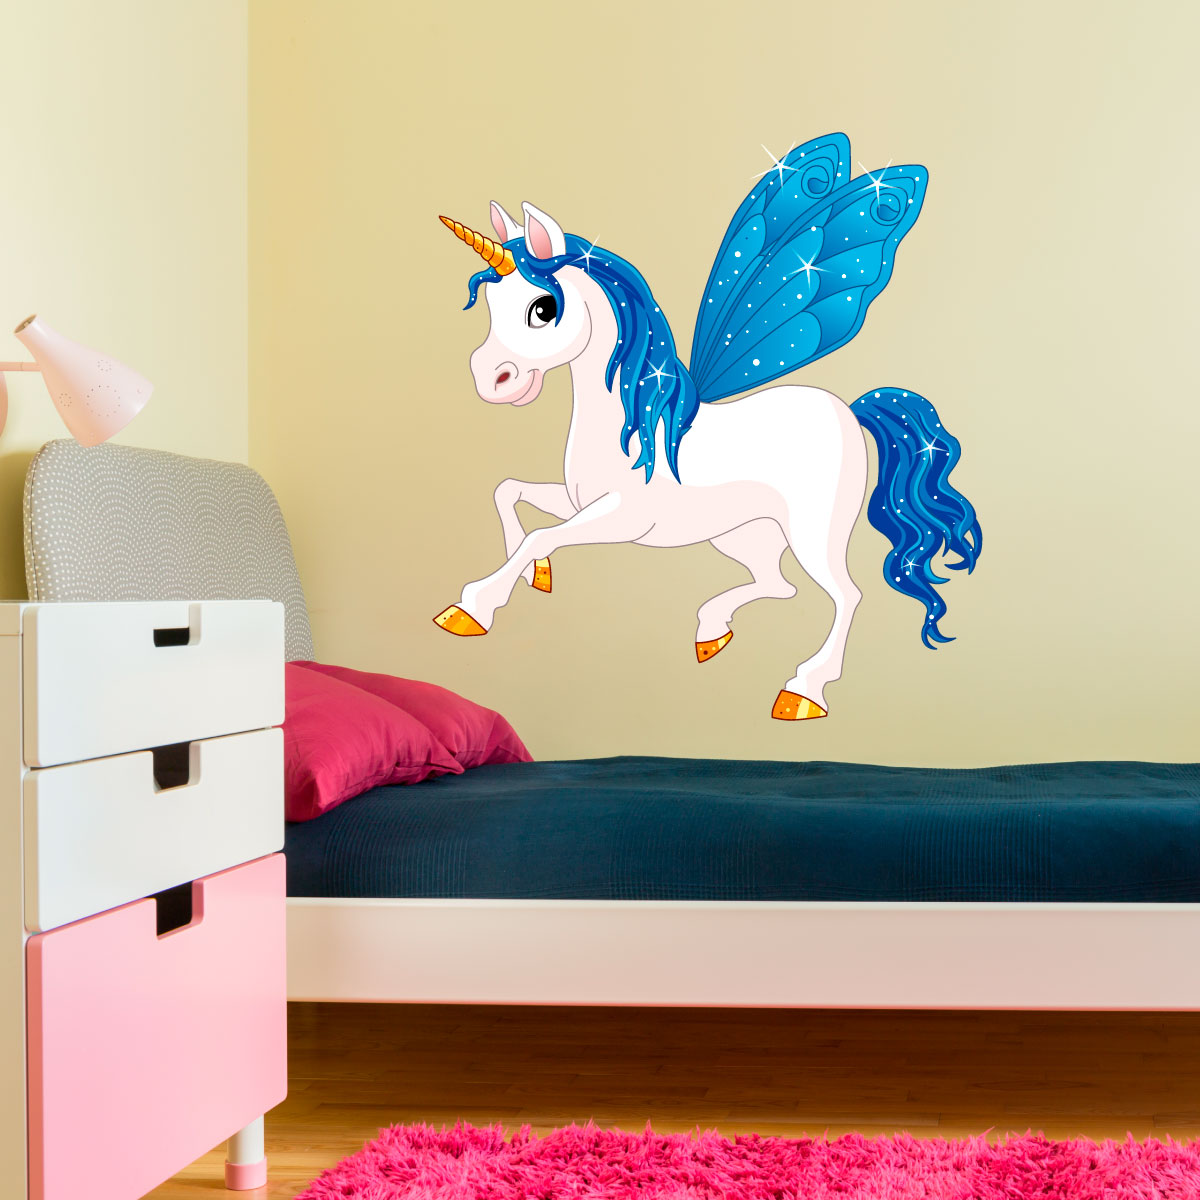 sticker licorne f erique stickers b b s fille ambiance sticker. Black Bedroom Furniture Sets. Home Design Ideas